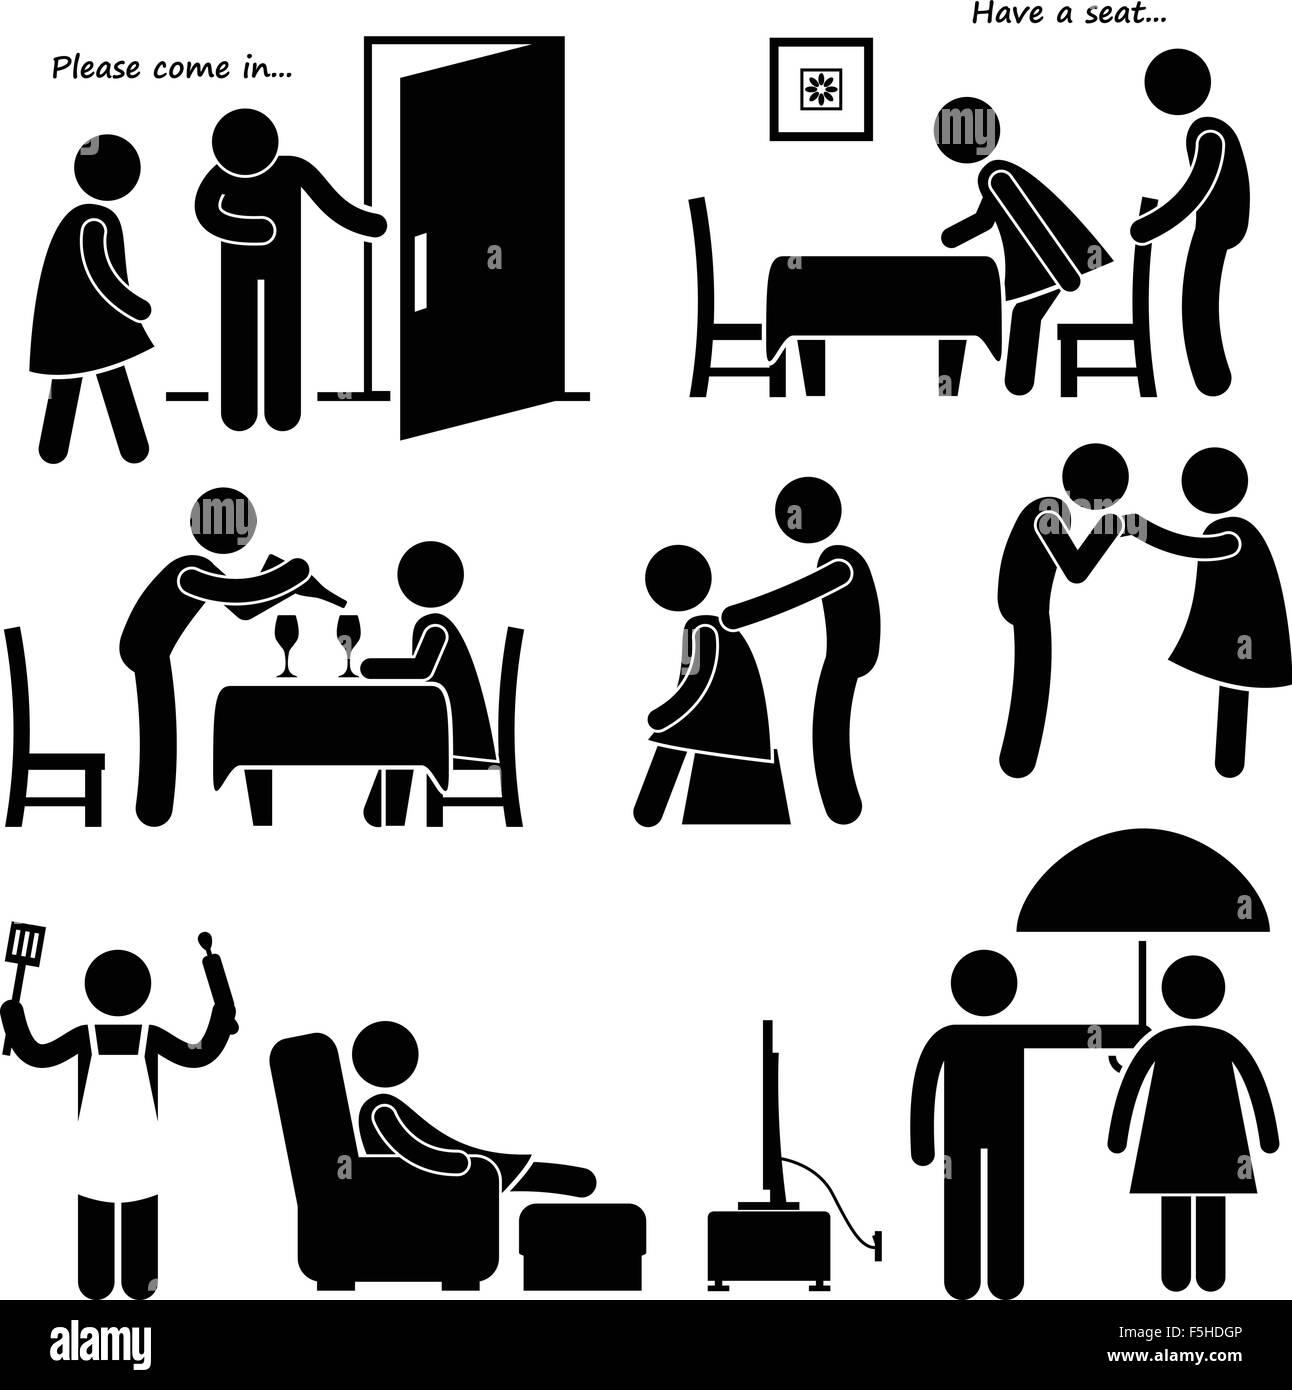 Gentleman Courteous Man Boyfriend Husband Stick Figure Pictogram Icon - Stock Image